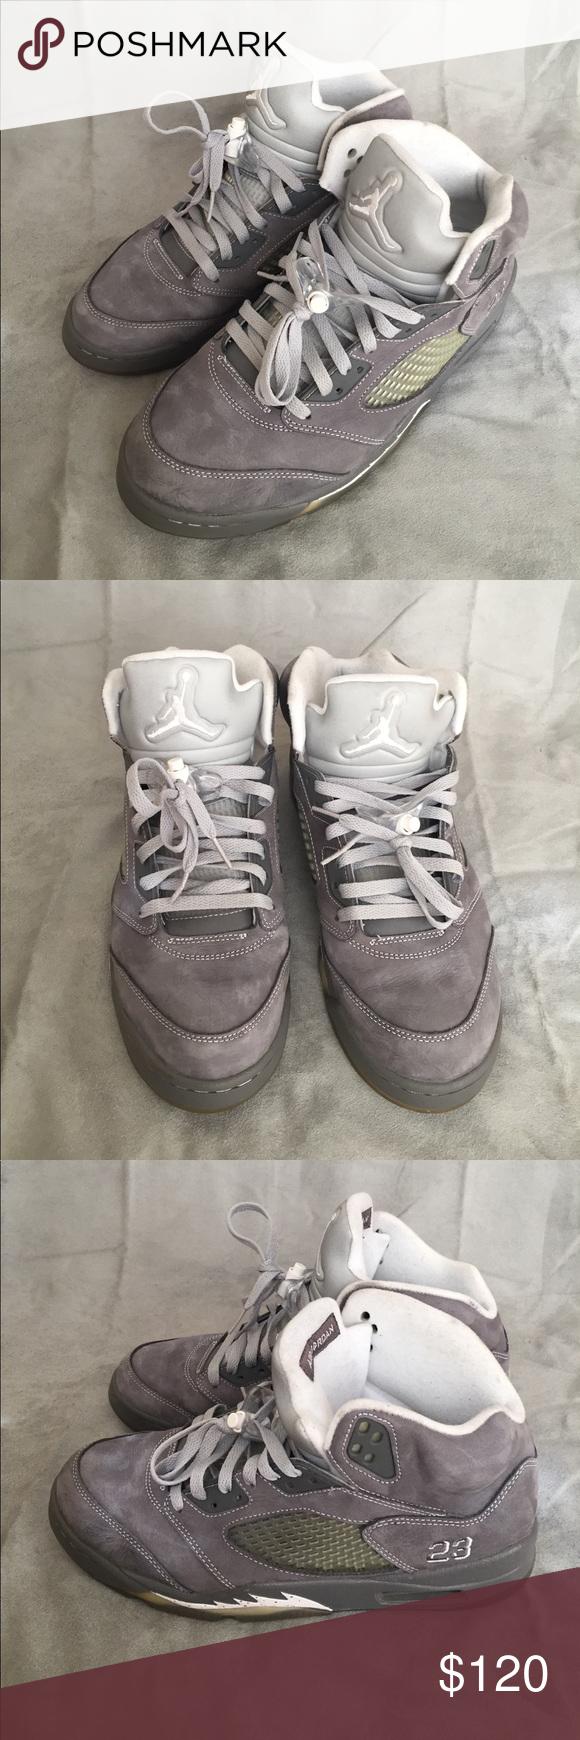 best sneakers e3a4e bd4f8 Nike Air Jordan 5 Retro Size 10 136027 005 Grey Great condition Nike Air  Jordan 5 Retro size 10 sneakers. Light graphite White-Wolf Grey. 136027 005.